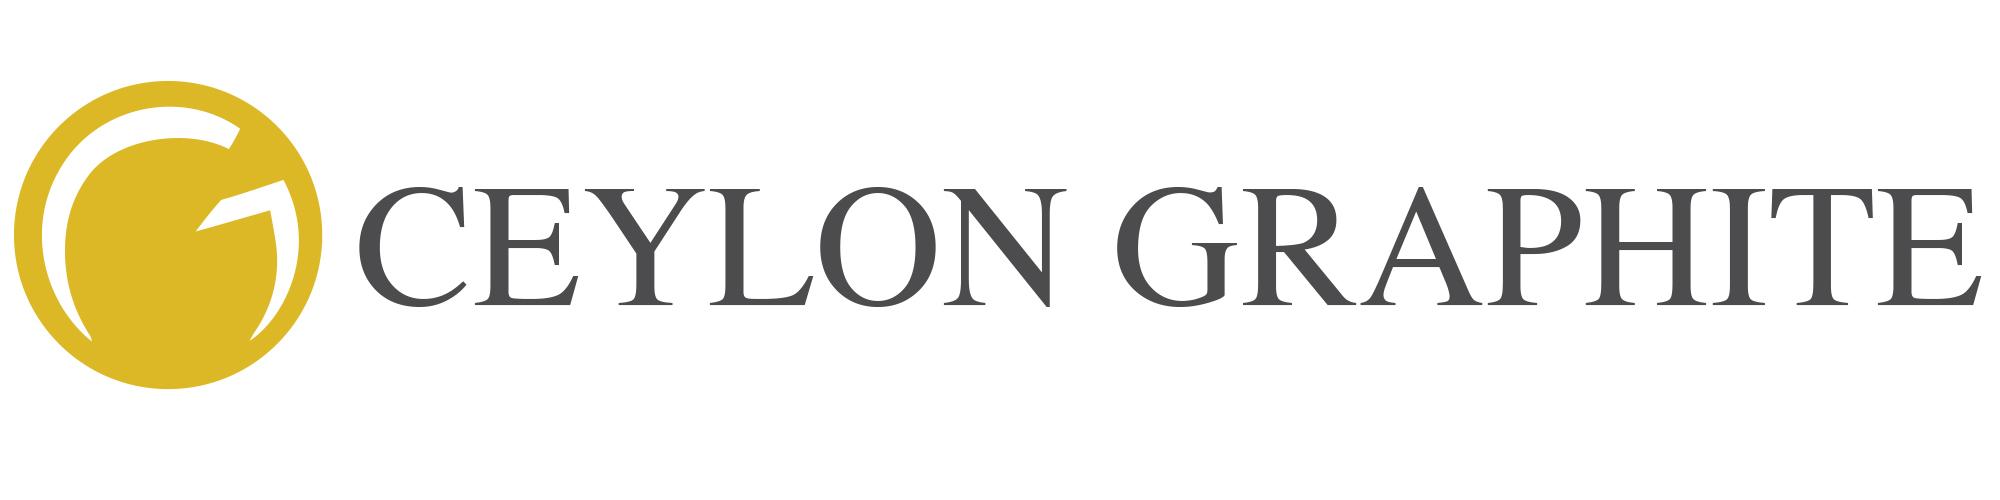 Ceylon Graphite Announces New Equity Offering